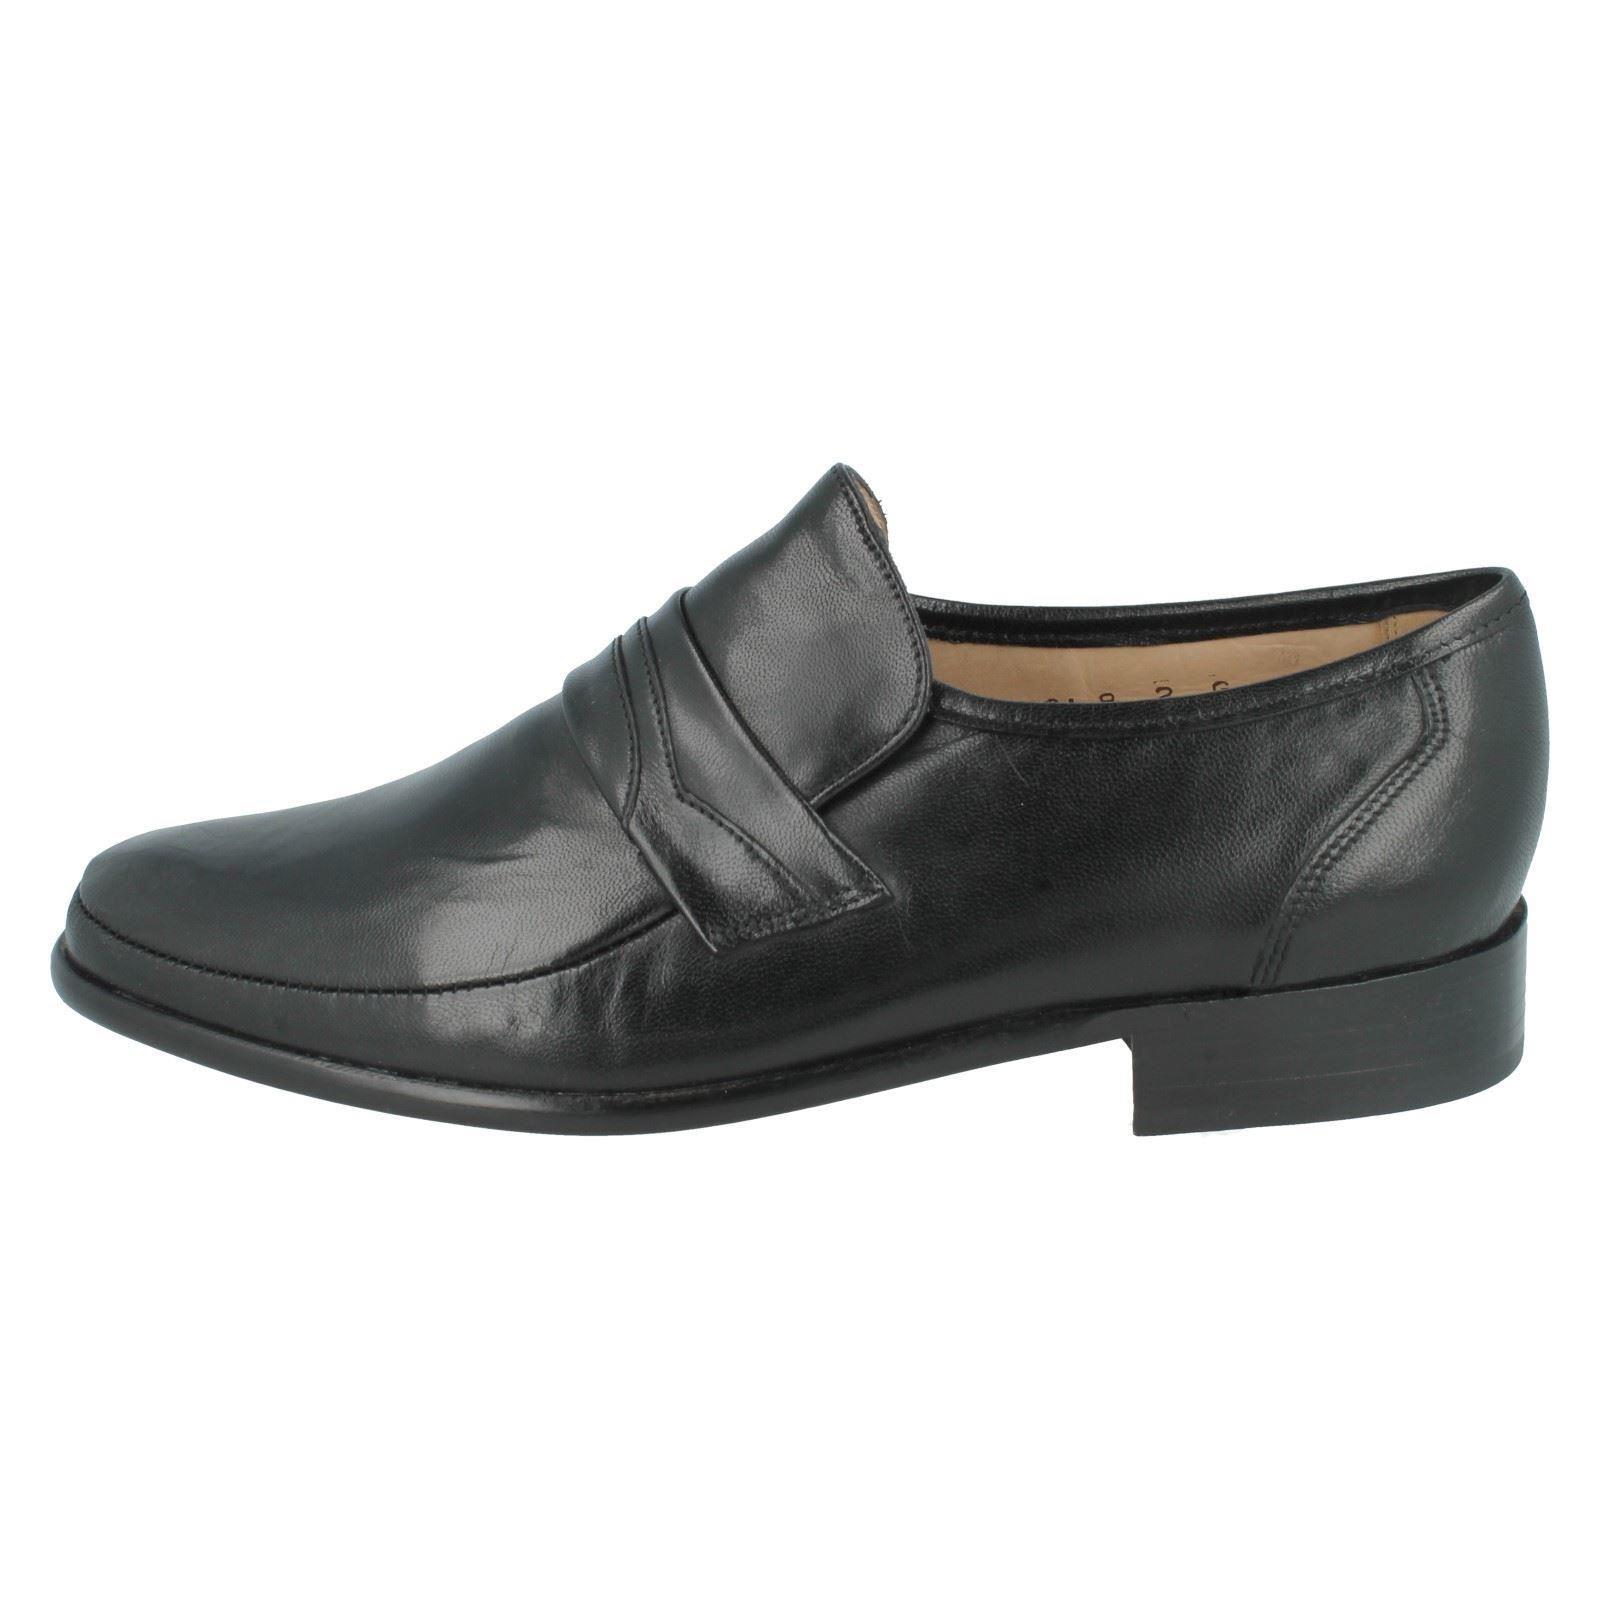 Black Grenson Formal Shoes LabelSwindon Fit G 35022 Mens iOuXTPkZ